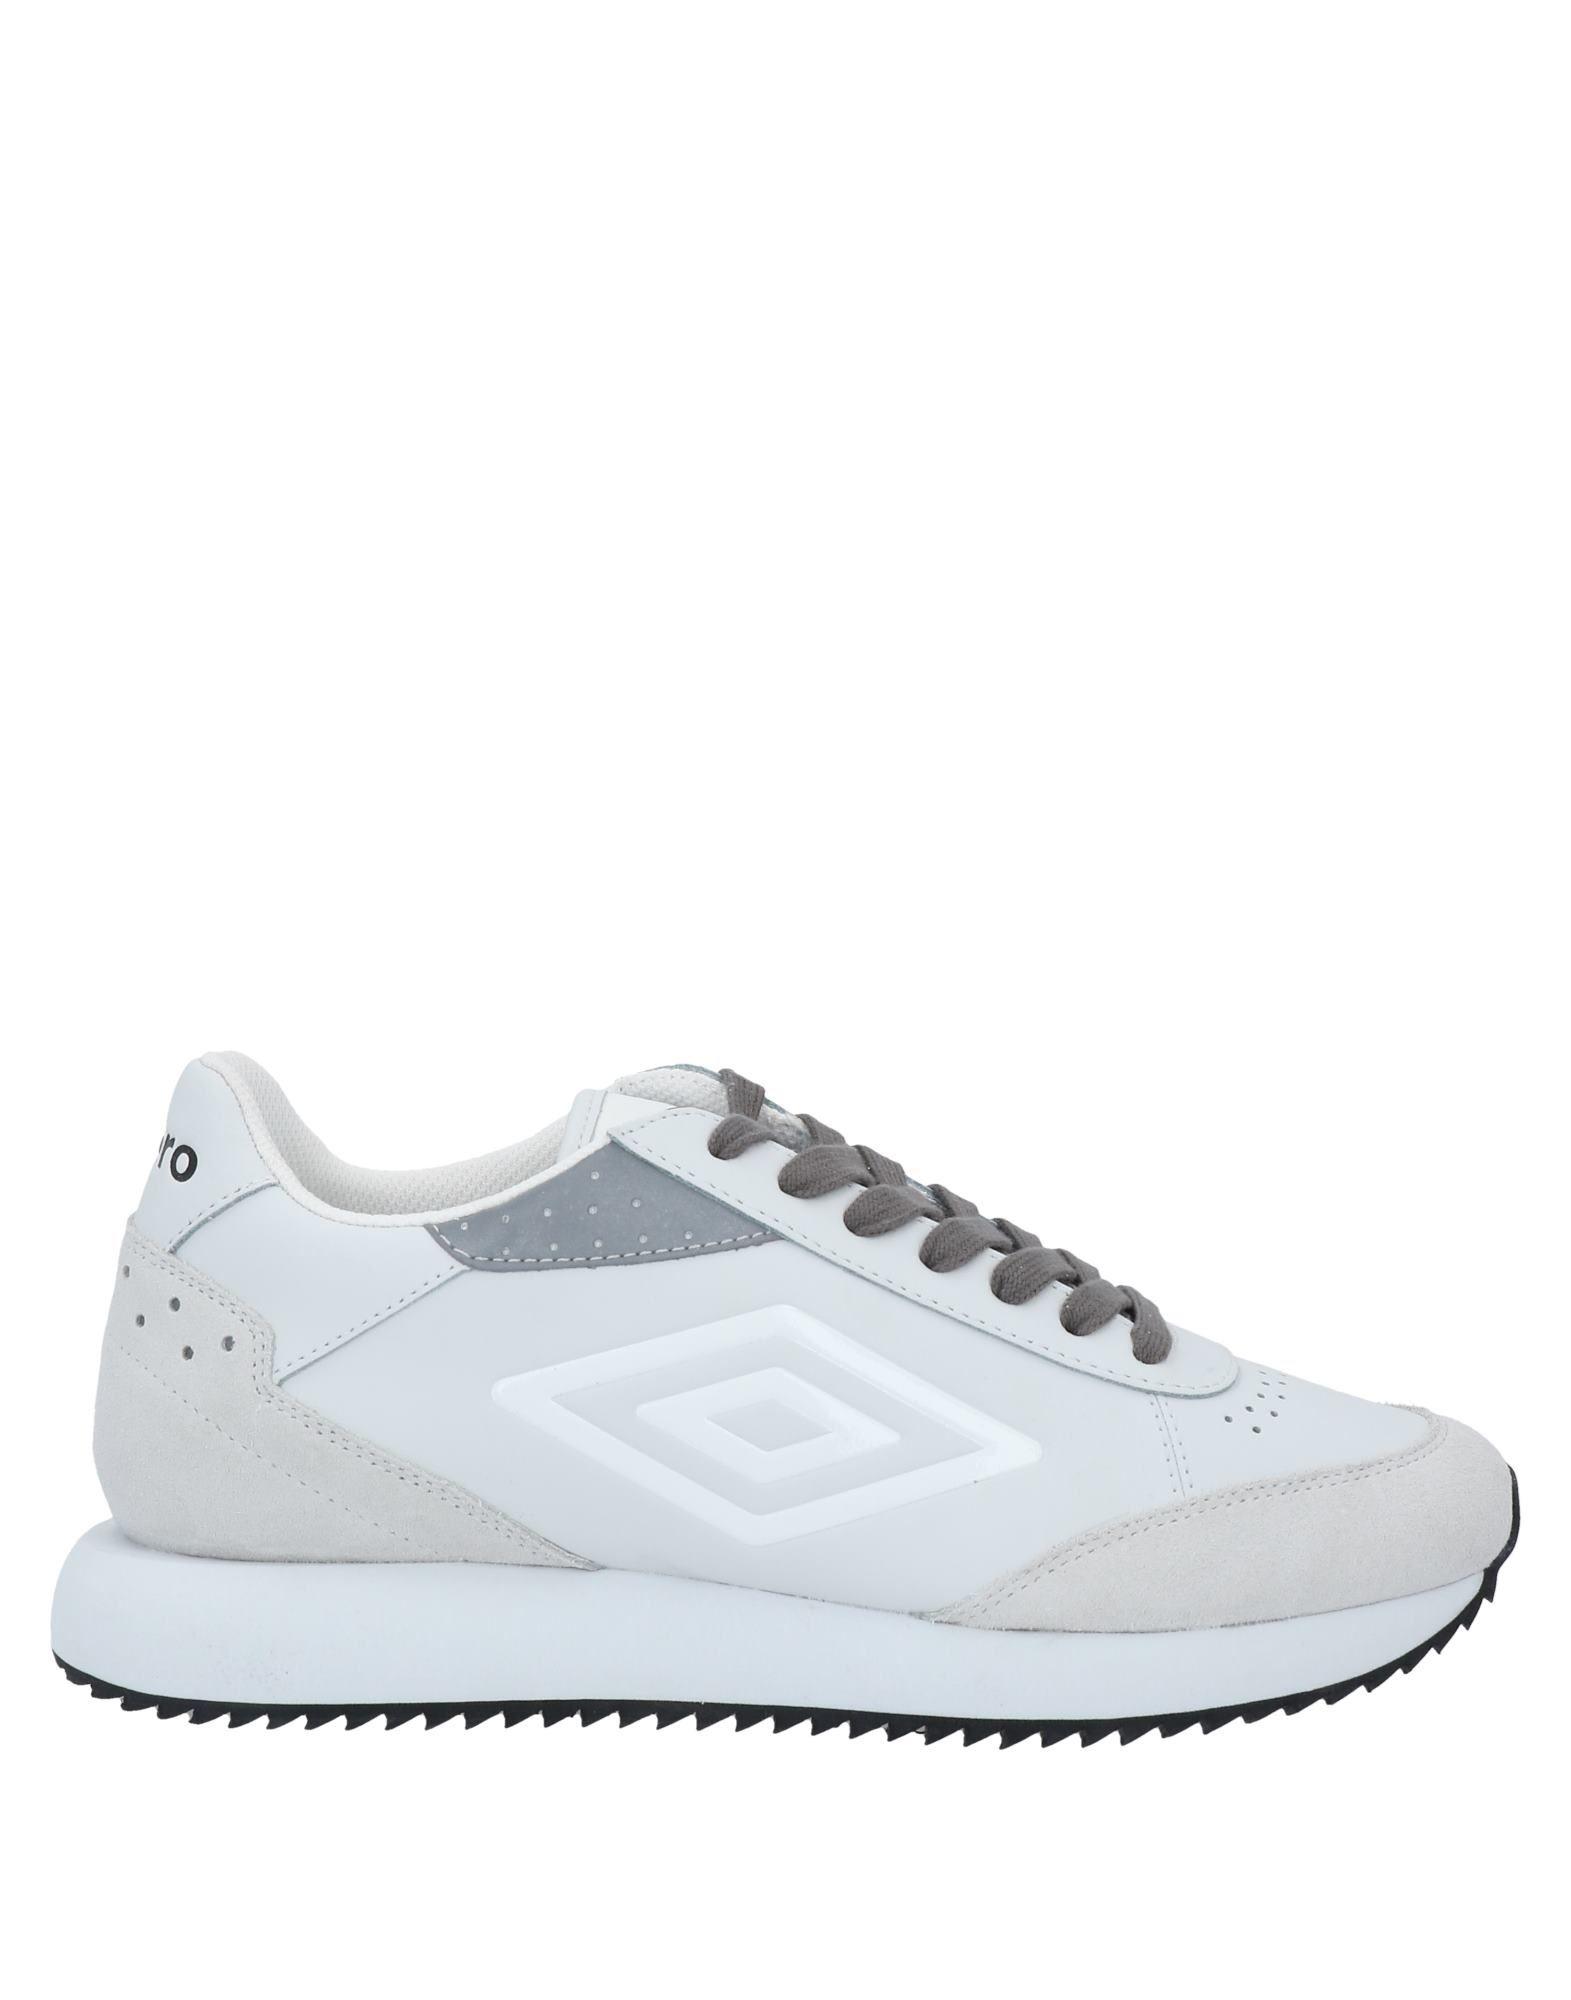 Umbro Sneakers In White